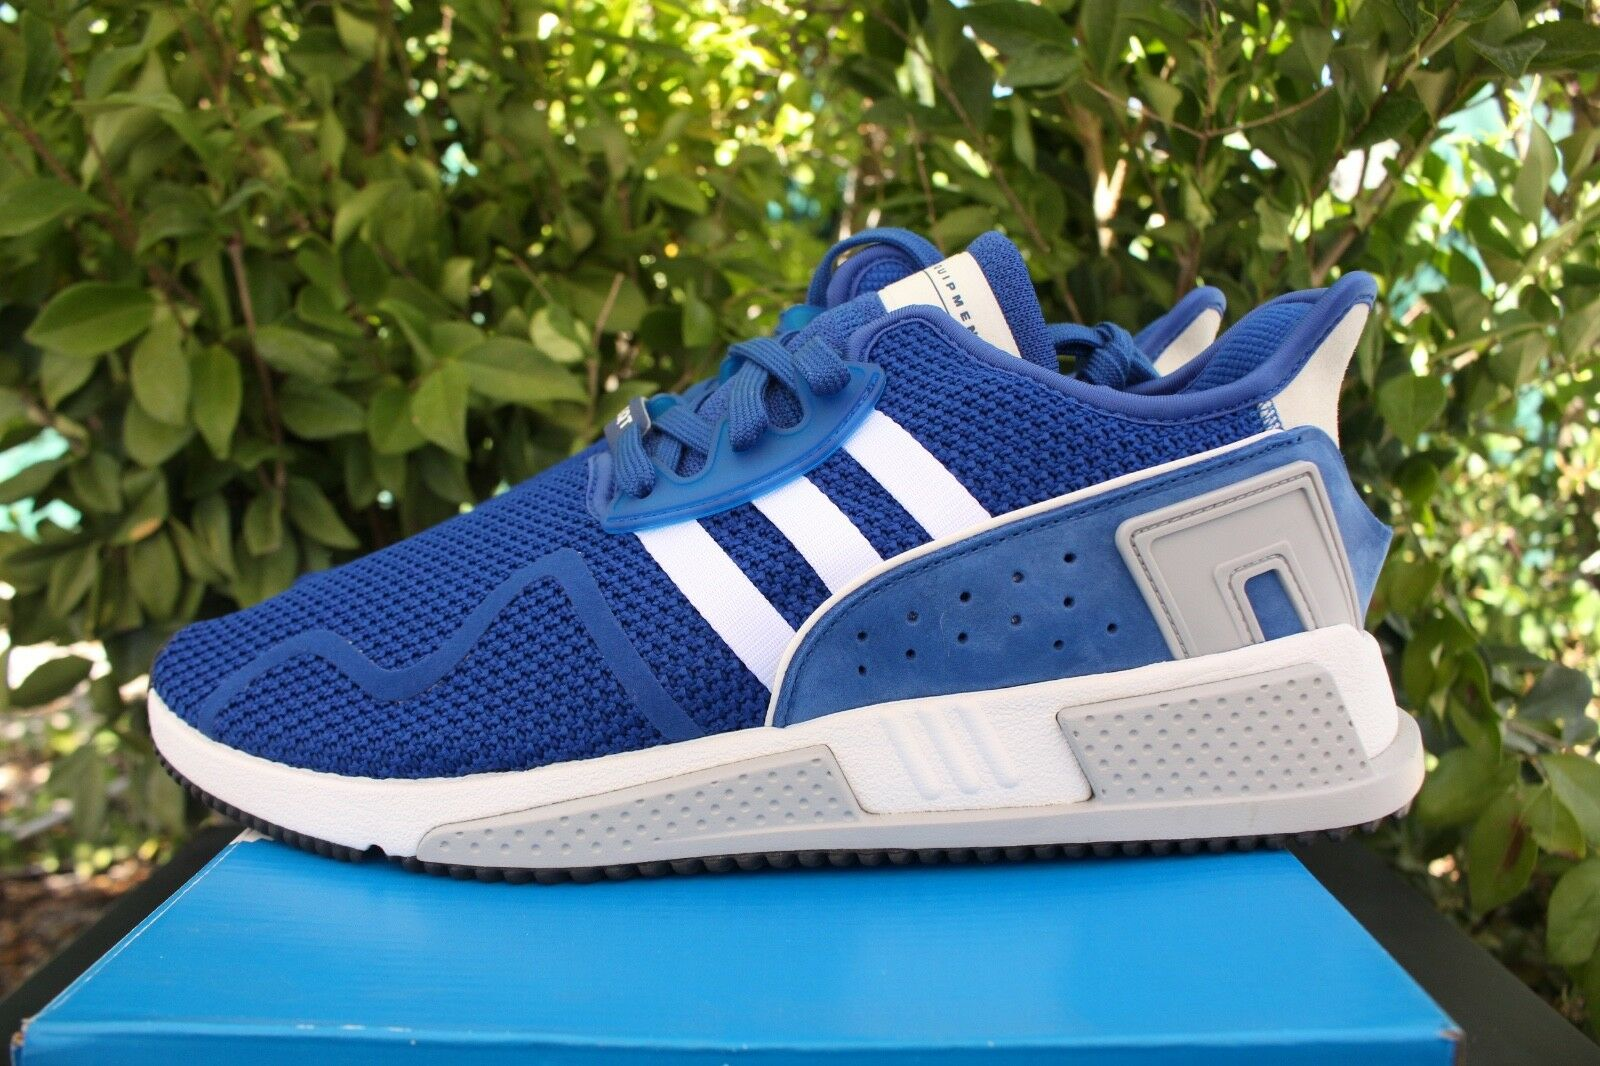 Adidas originals eqt kissen adv sz 12 royal blau - strick weiße strick - cq2380 e84f4e